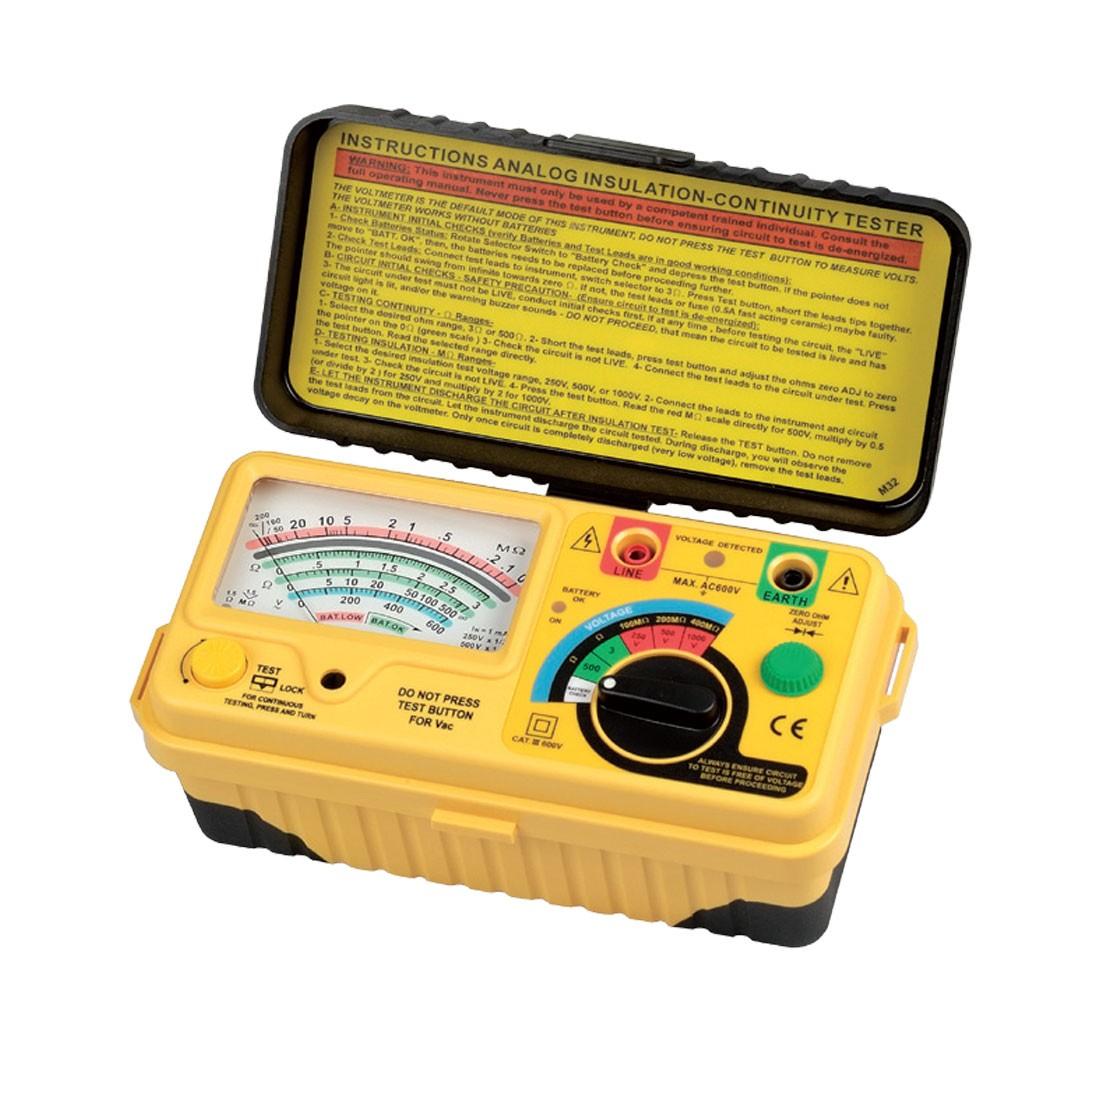 1132IN Series: Analogue (1kV below) Insulation Tester